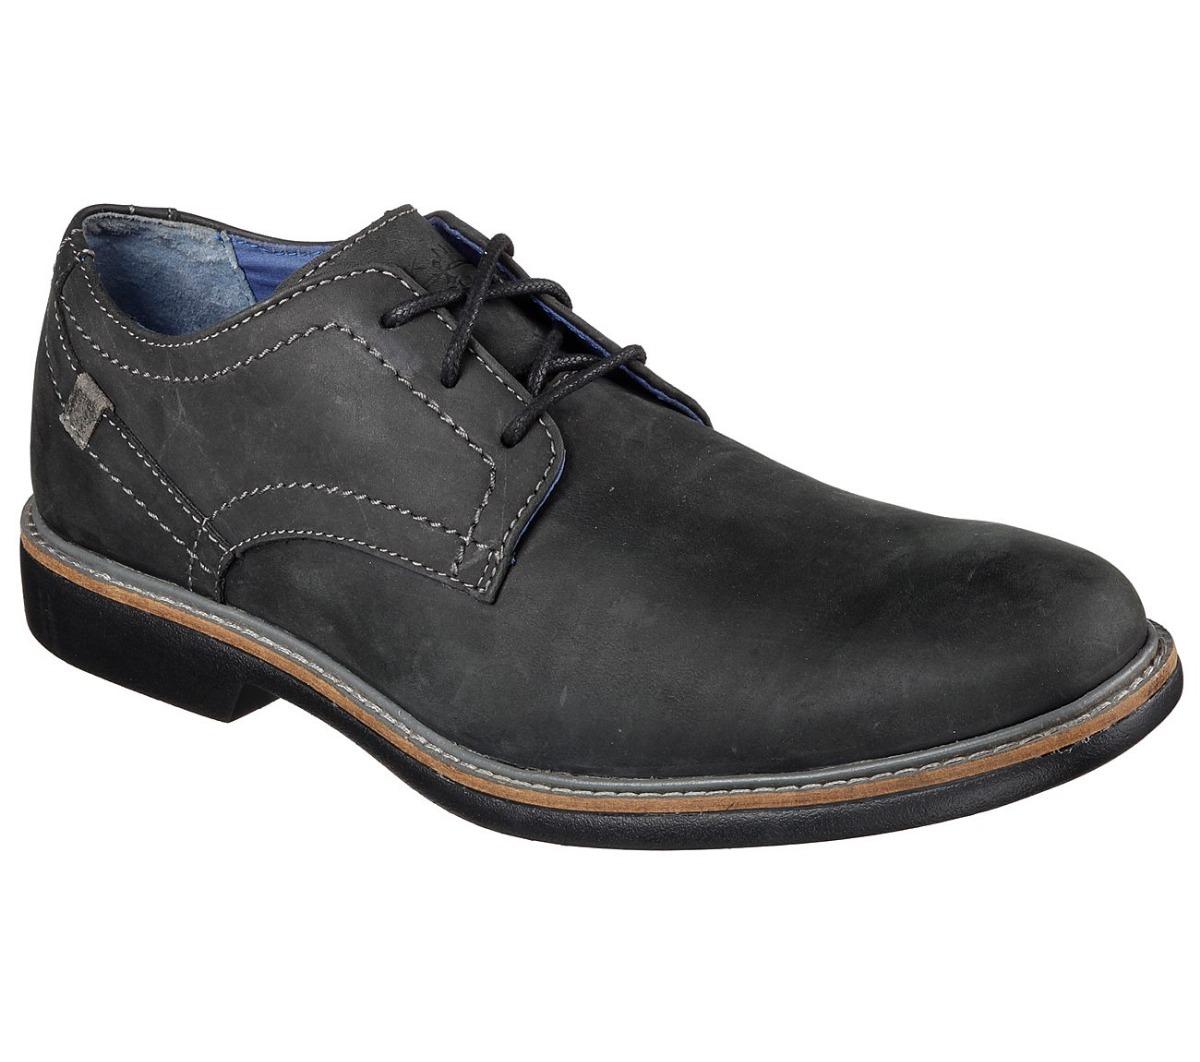 Skechers Malling Zapato Hombre Mark Nason Black 4LA53jcRq